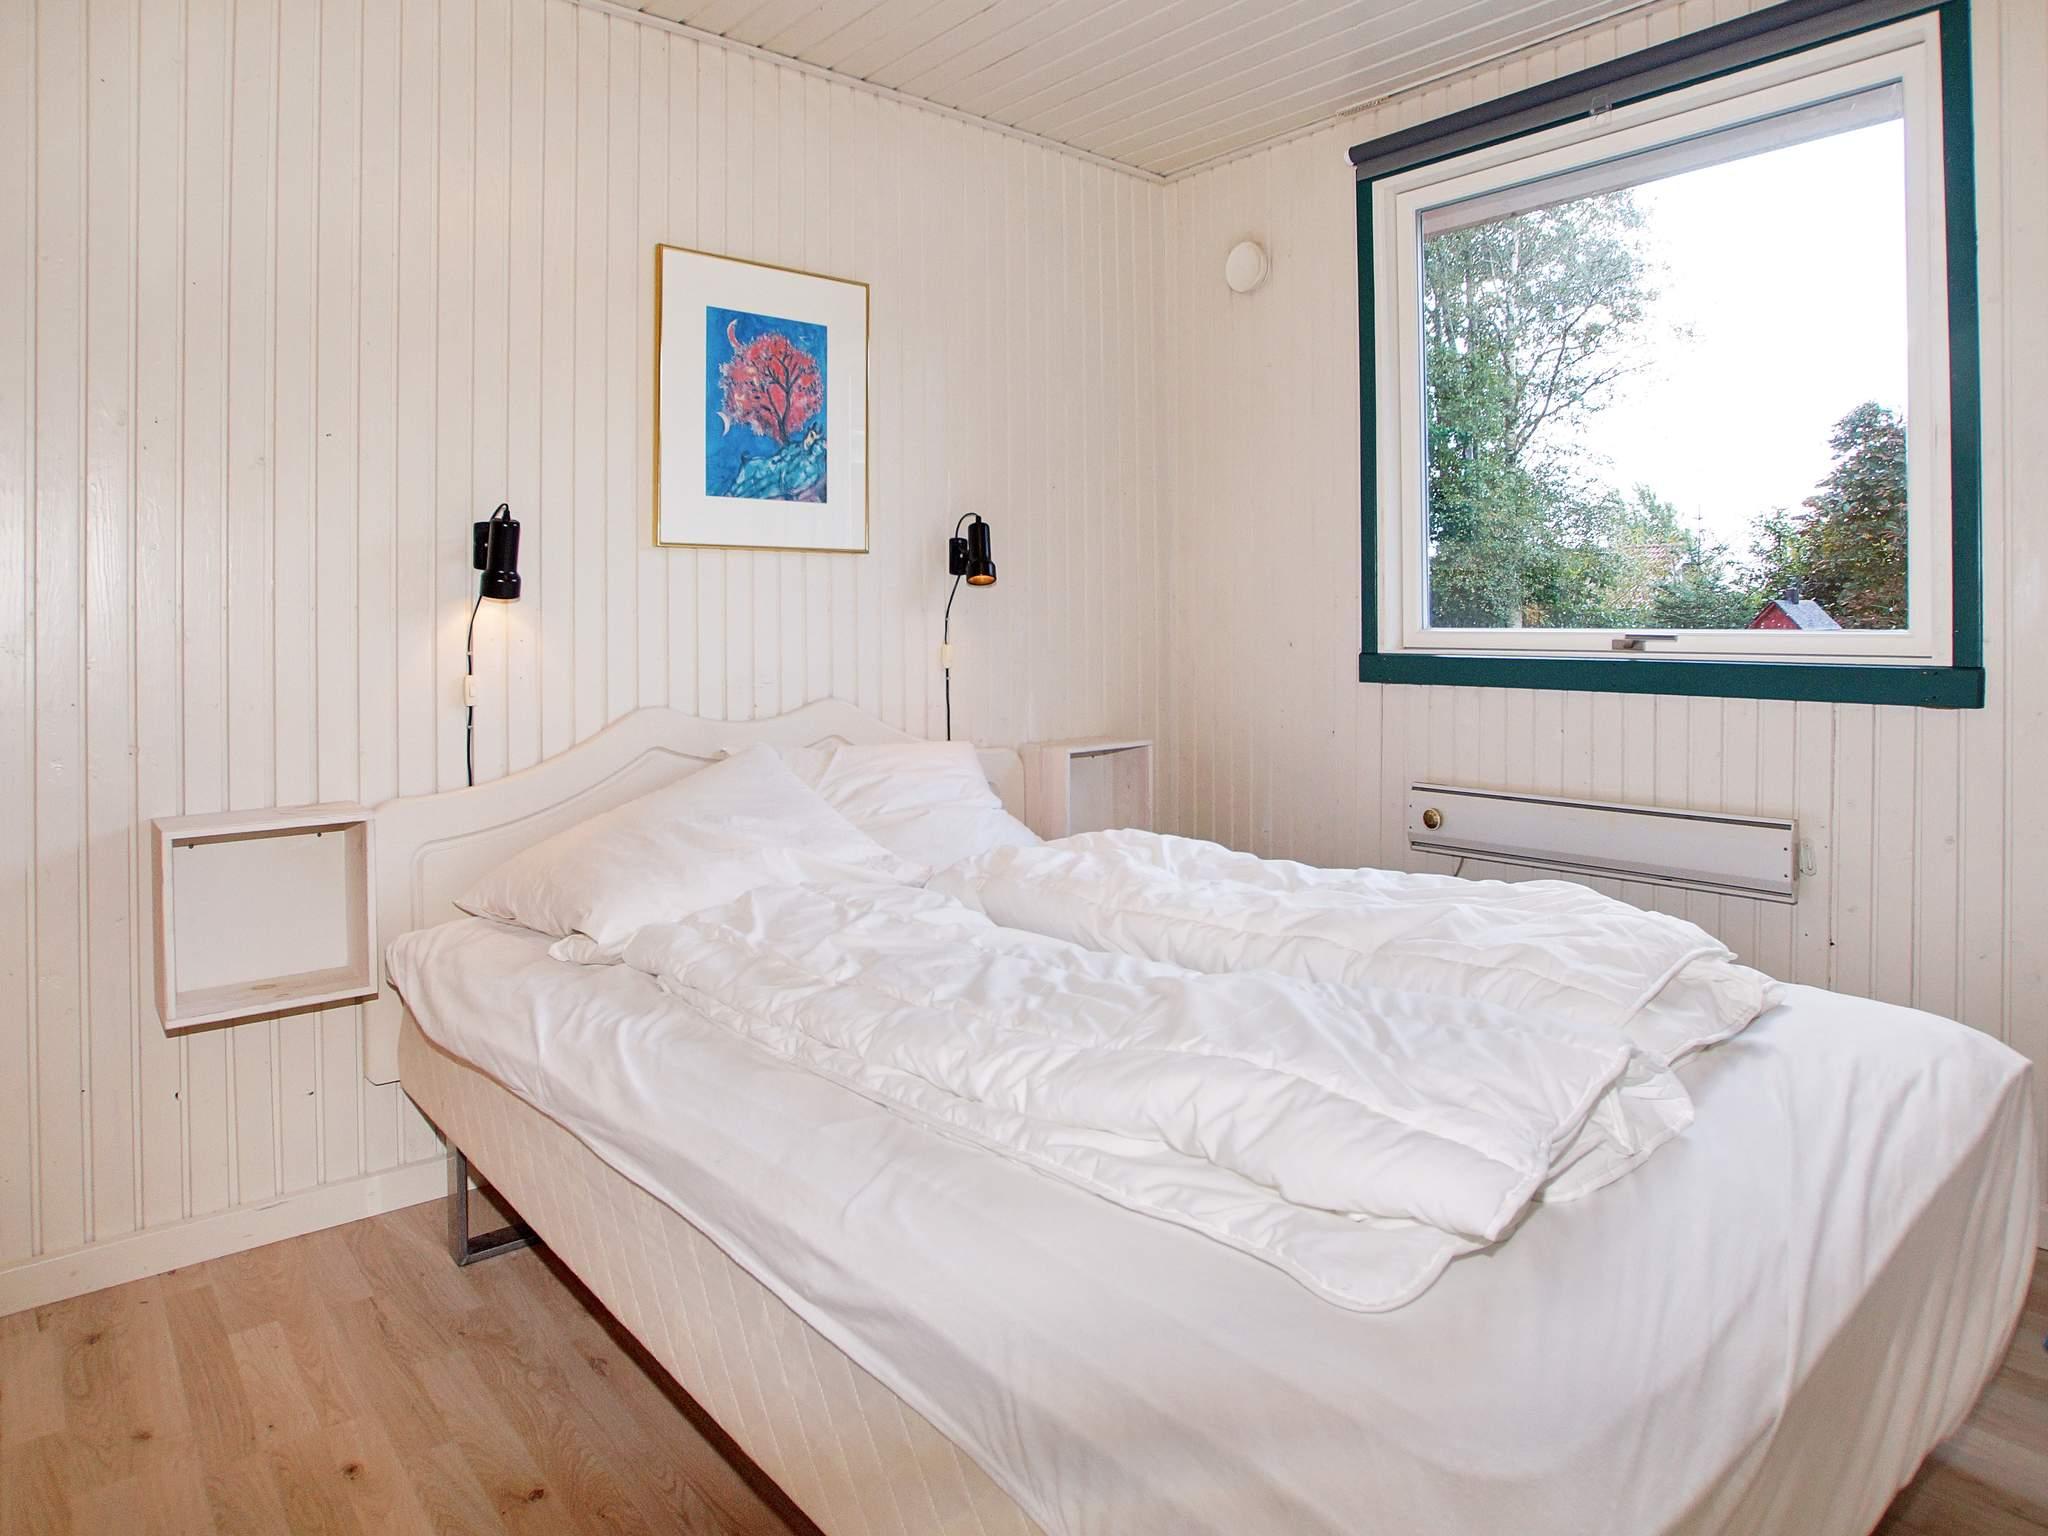 Ferienhaus Skaven Strand (493385), Tarm, , Westjütland, Dänemark, Bild 18